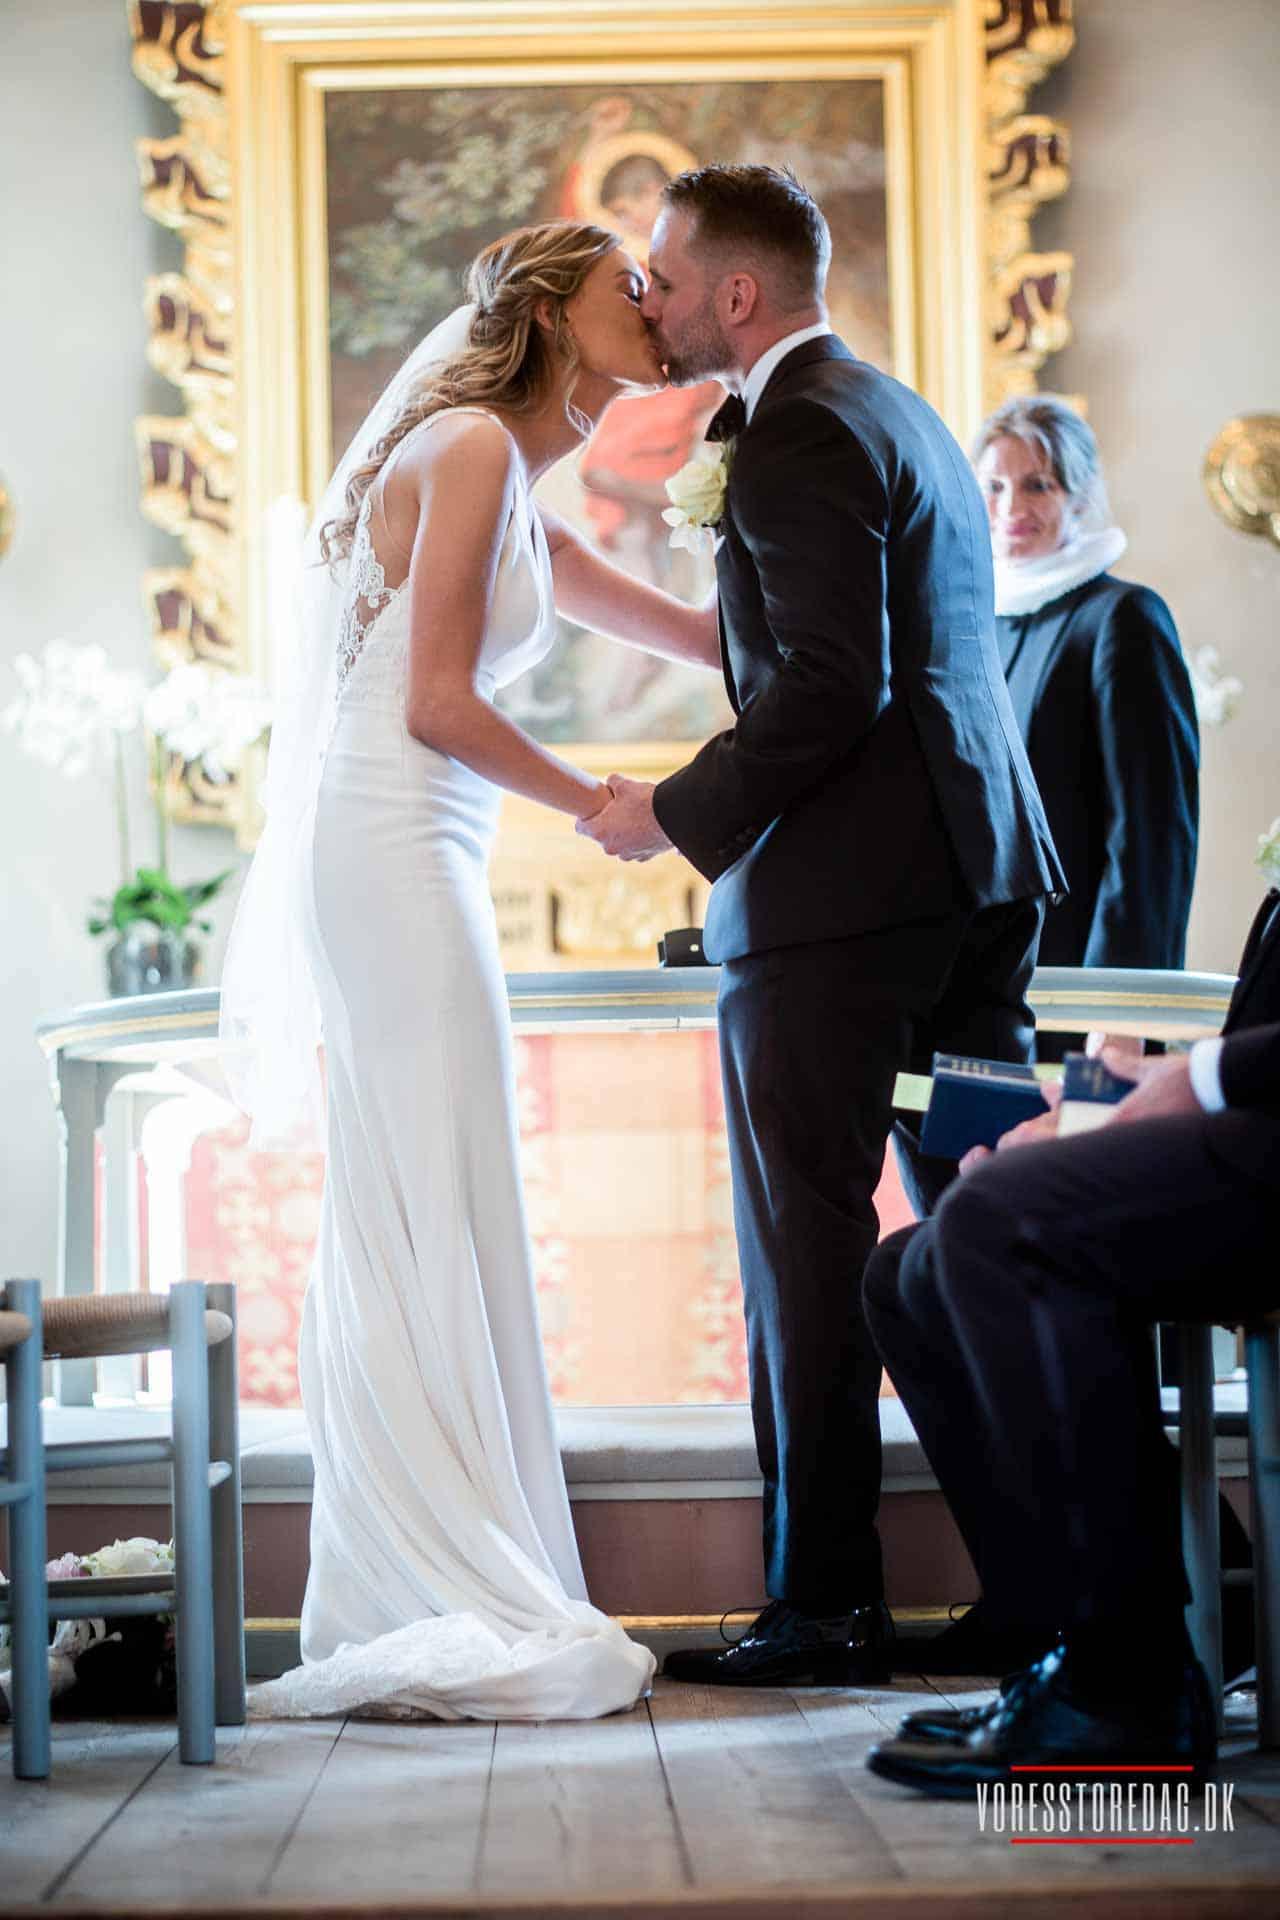 Bryllupsfotograf - tips og tricks - Bryllupsfotografering